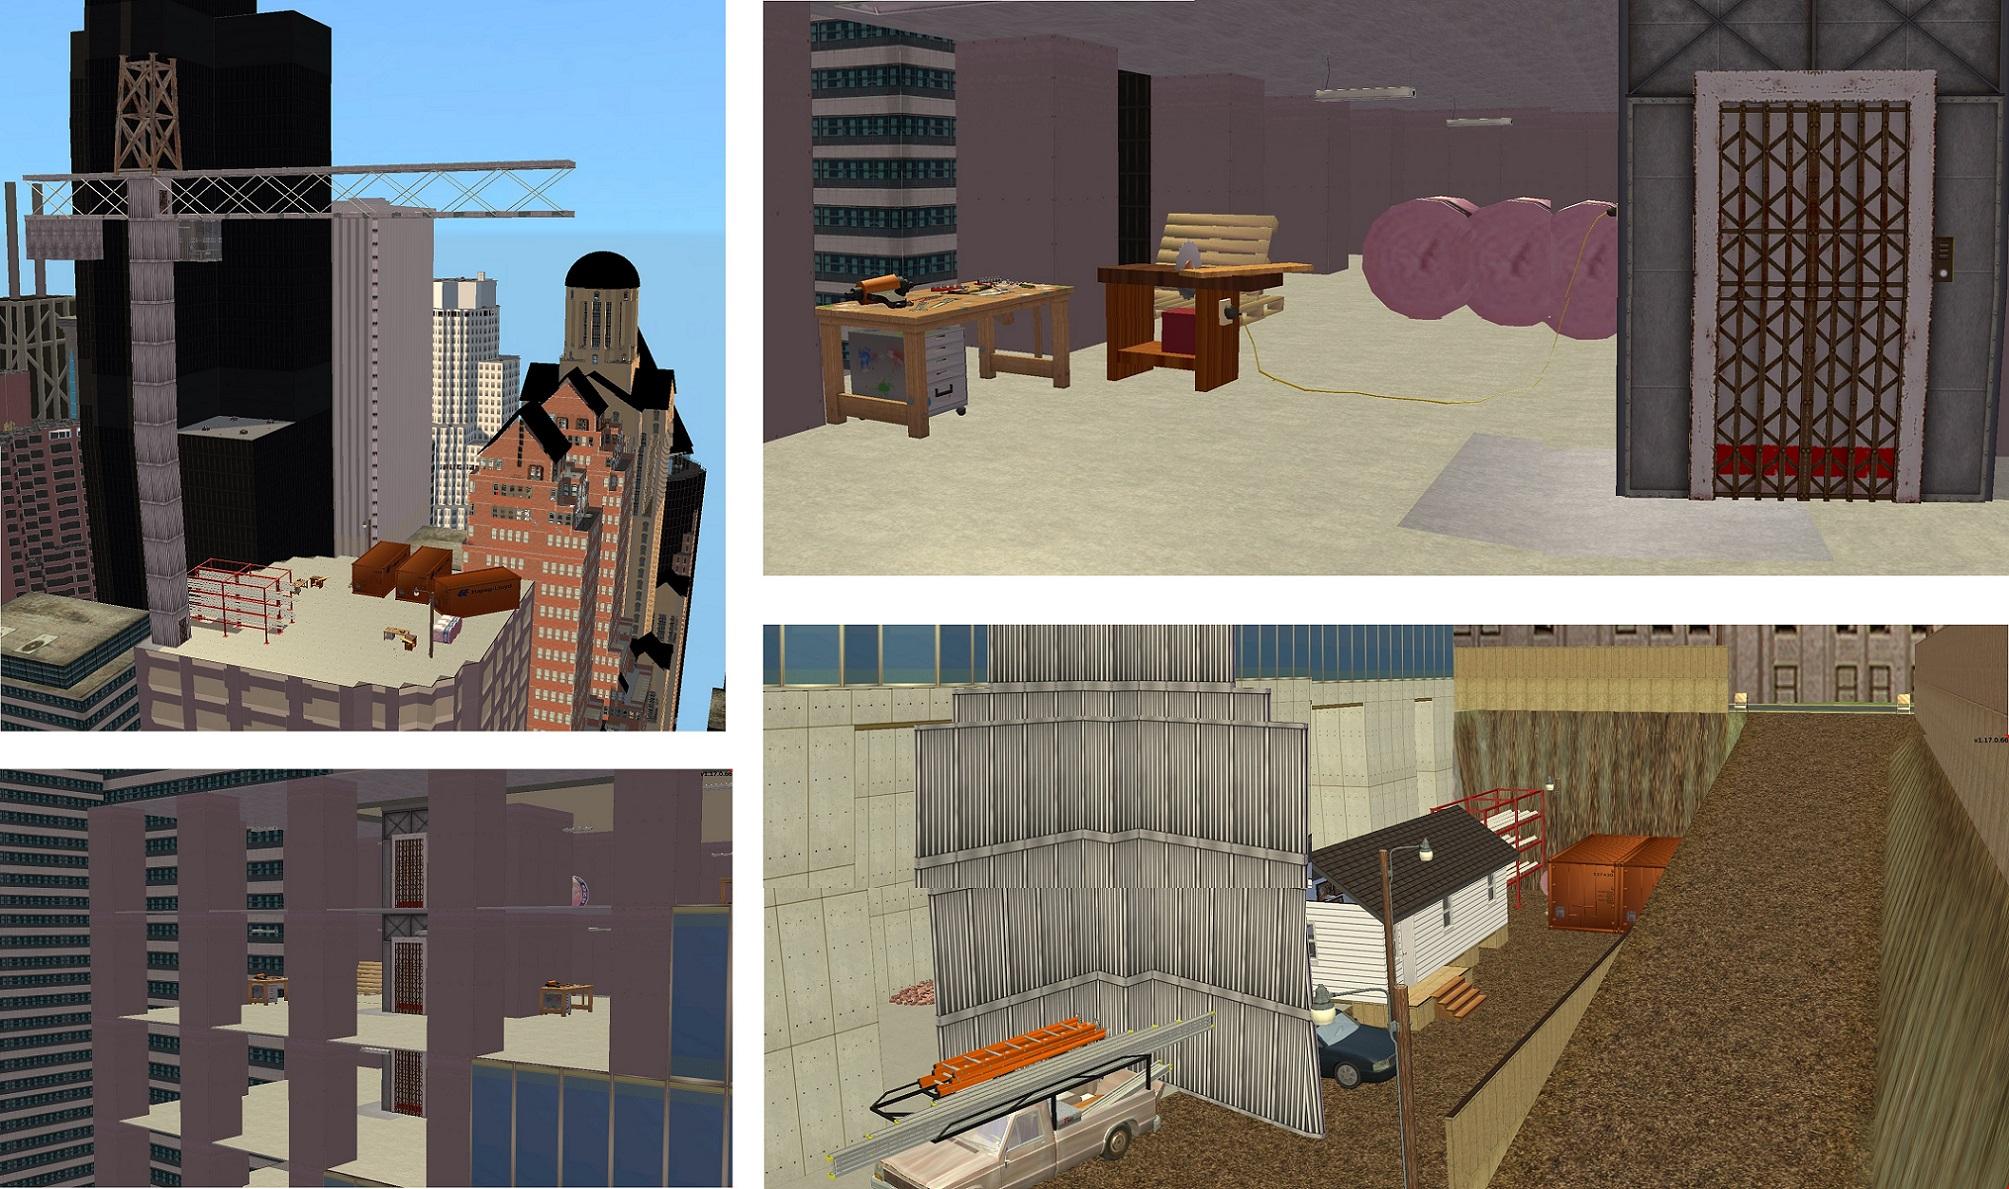 Mod The Sims - Skyscraper Under Construction